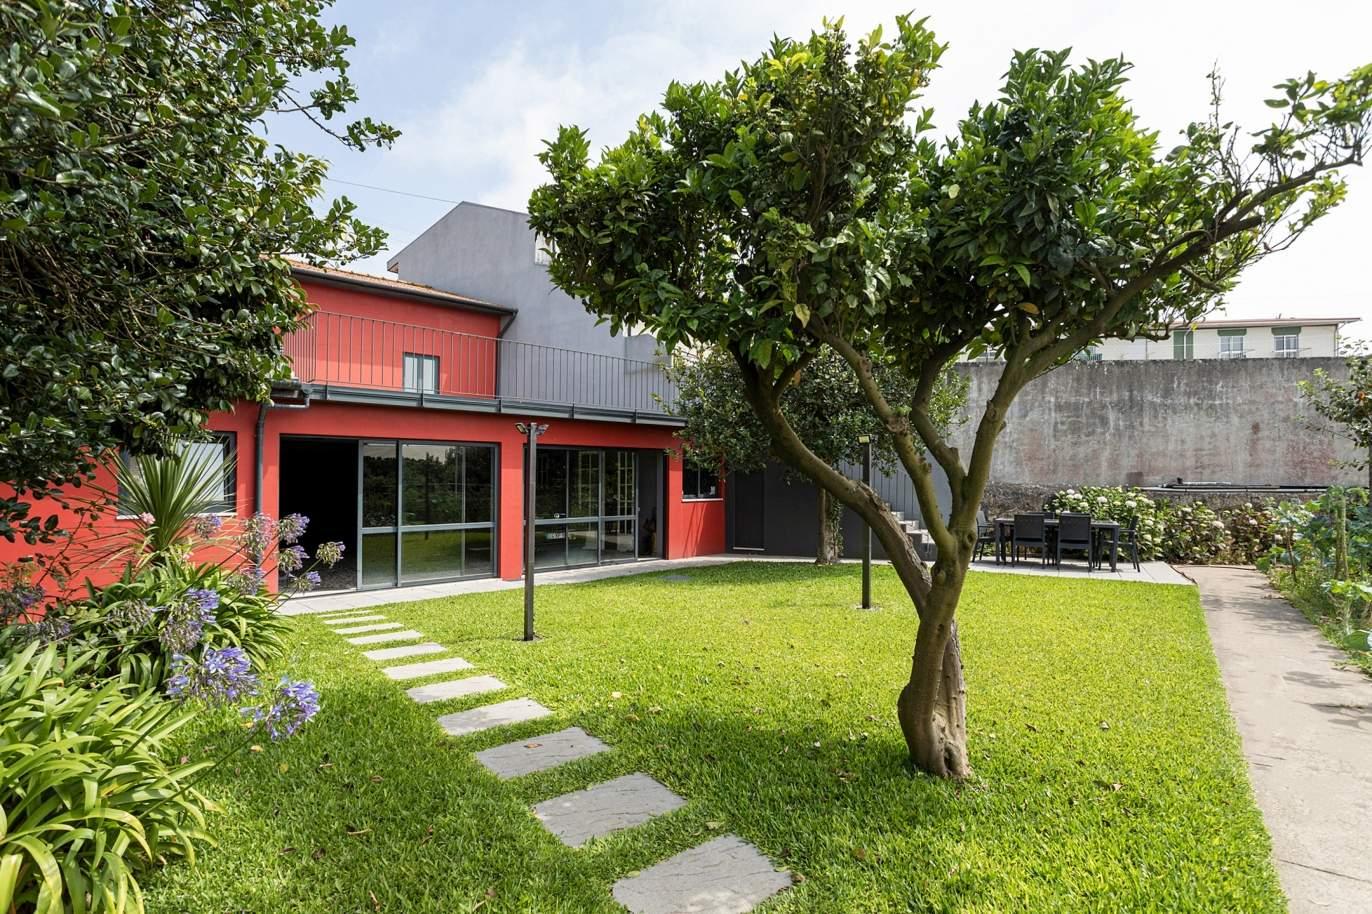 renovated-villa-with-garden-for-sale-close-to-the-beach-in-lavra-porto-portugal